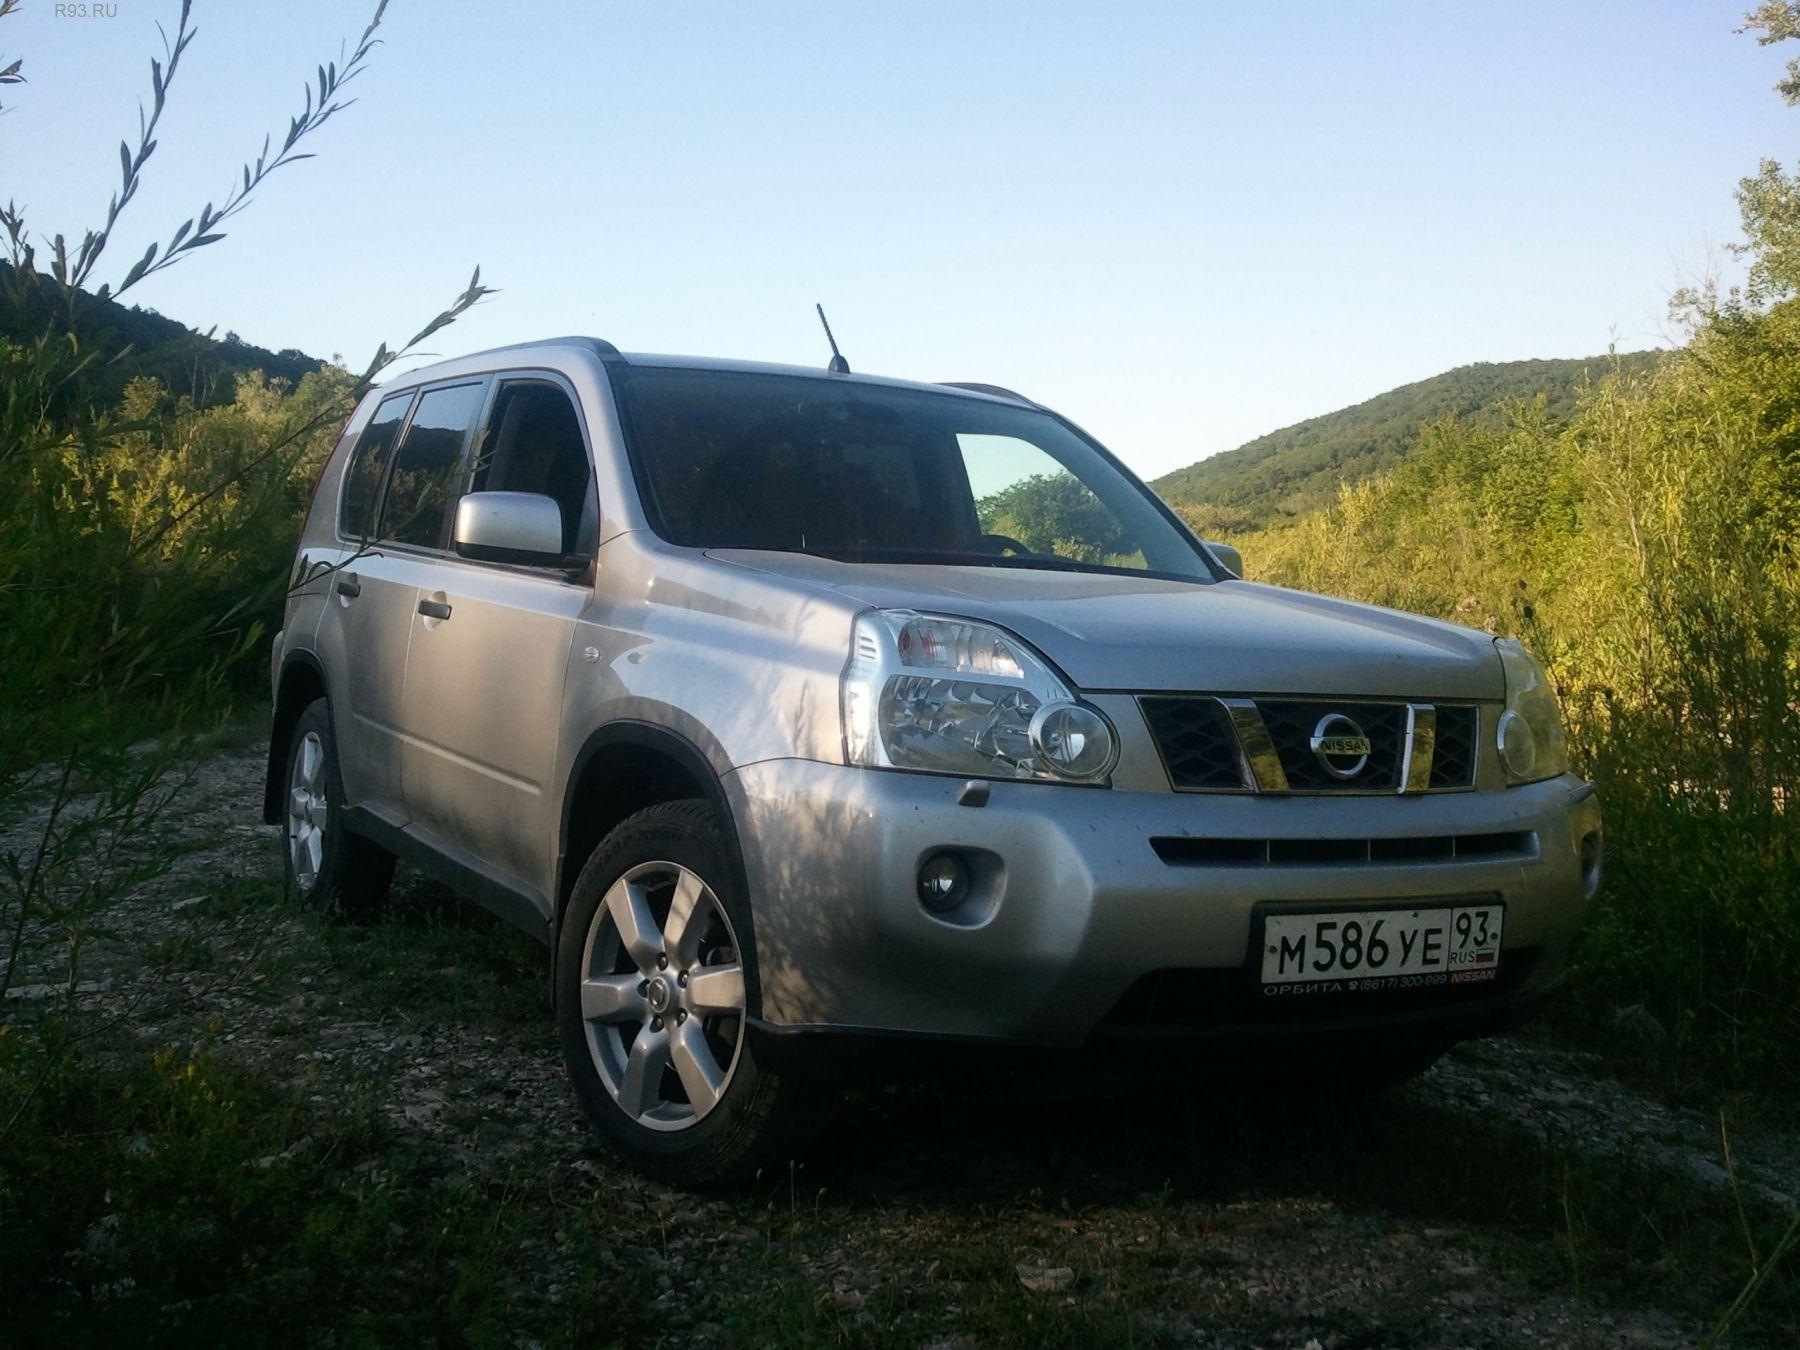 Авто в кредит в автосалоне севастополя